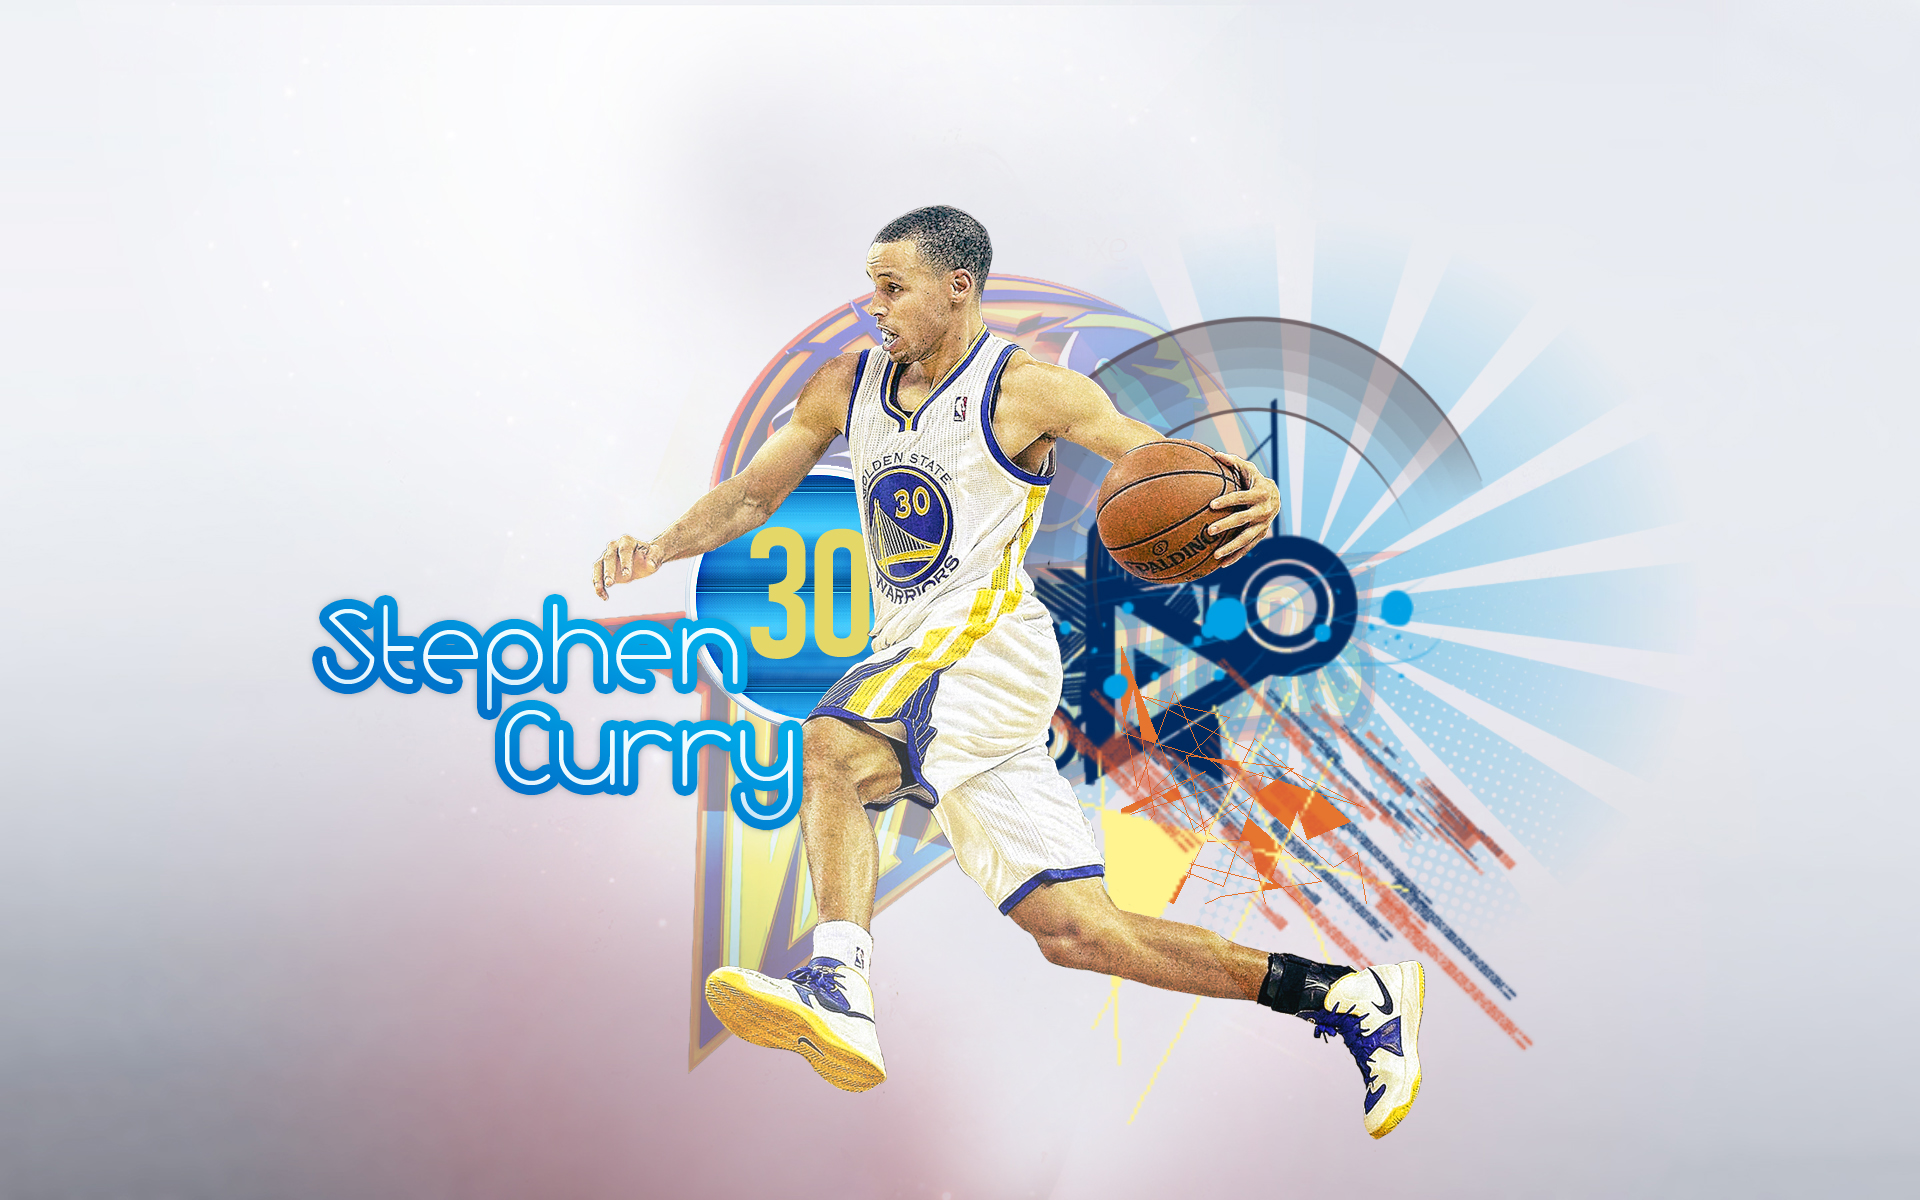 Stephen Curry HD Wallpaper Basketball Wallpapers High cute 1920x1200